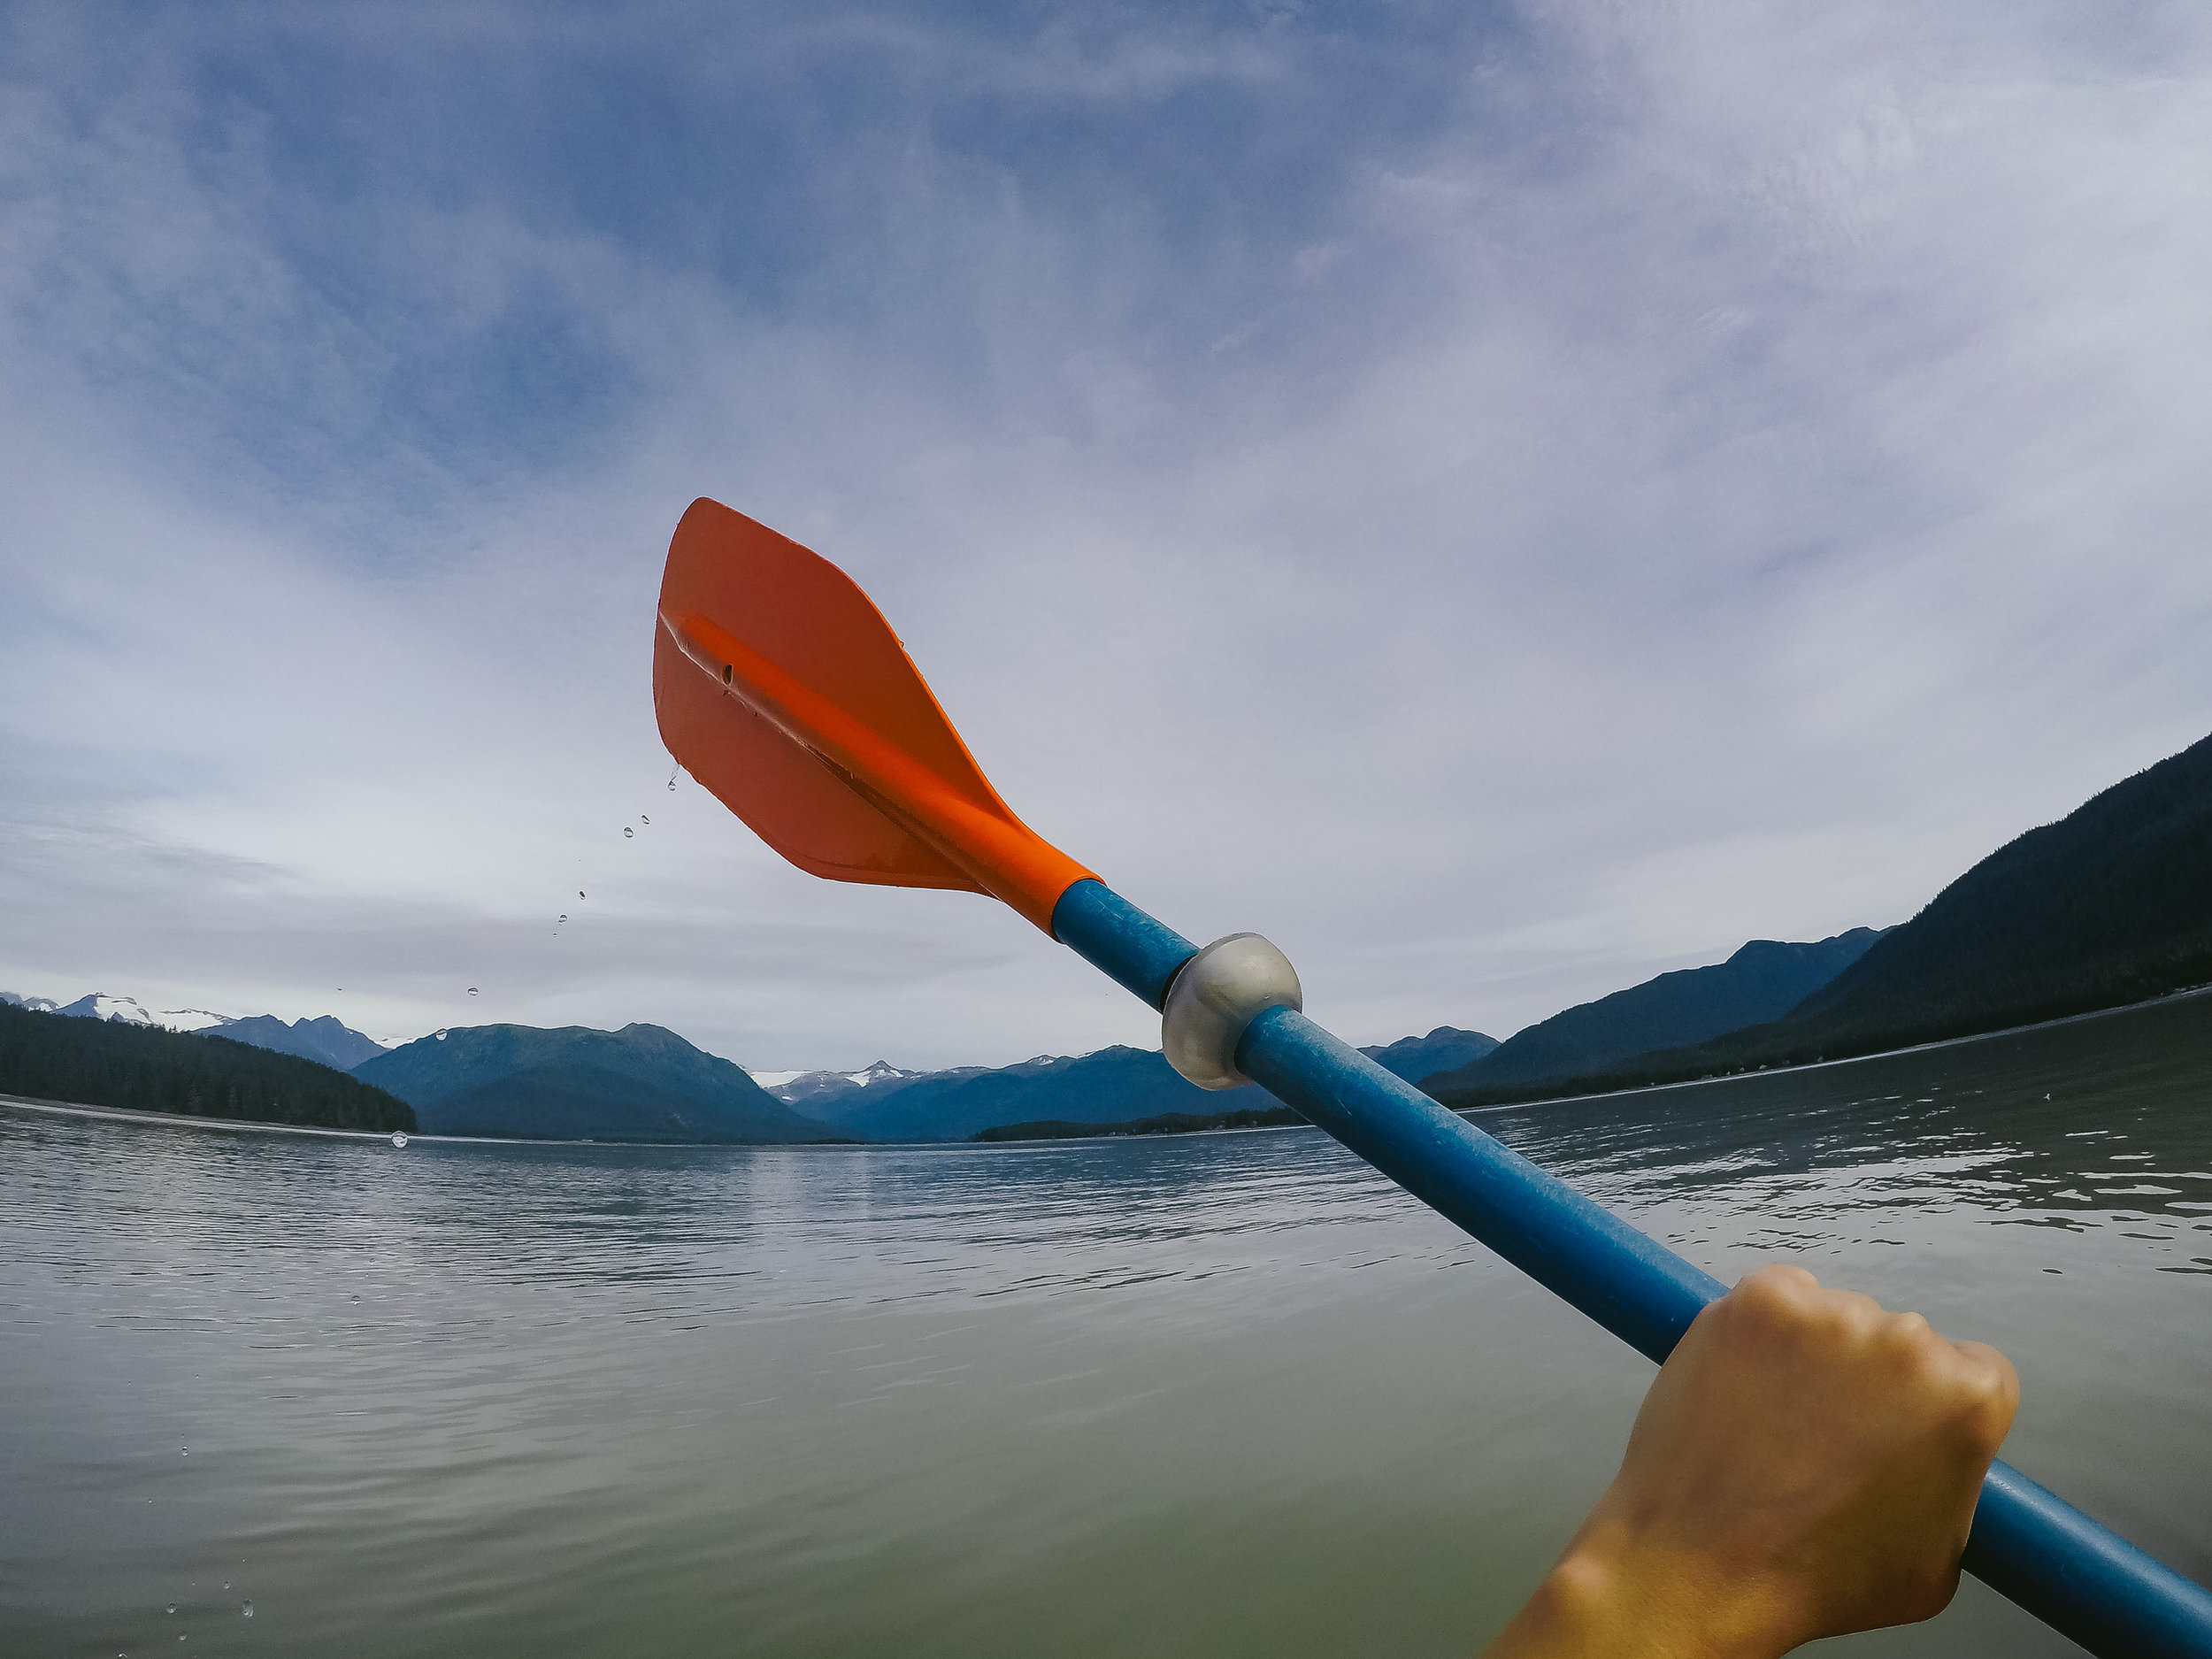 kayak_go_pro_juneau_alaska_adventure_tiny_house_photo-10.jpg